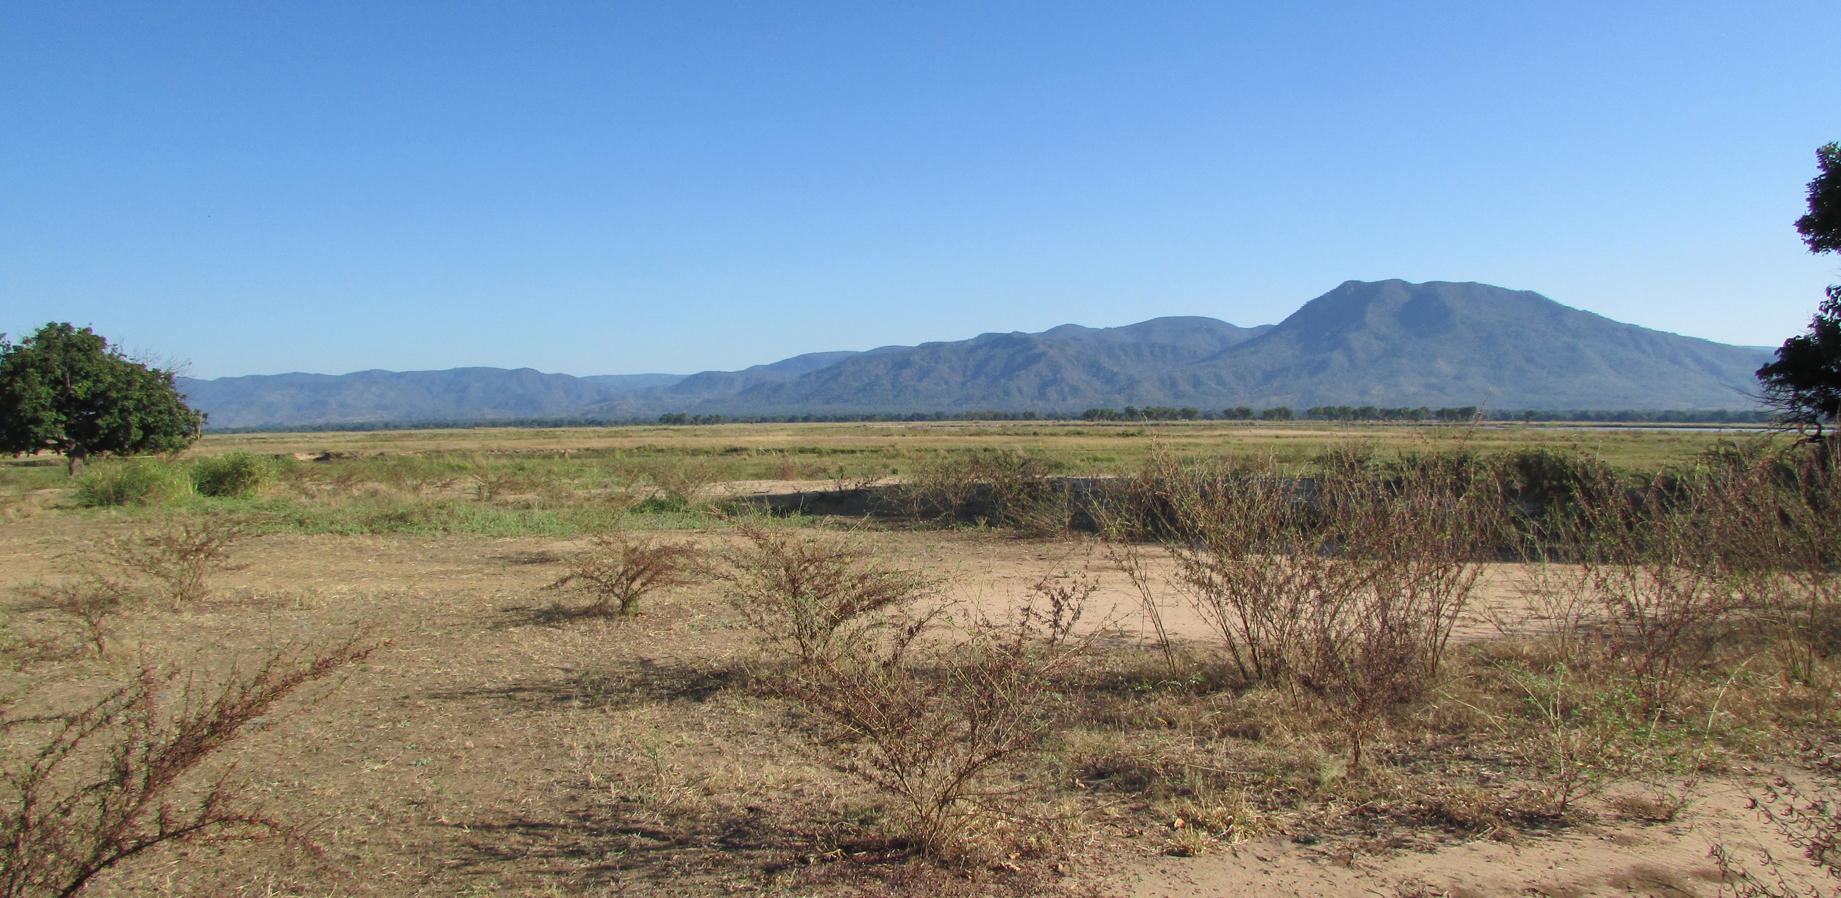 View of the Zambezi River from Nkupe site.jpg